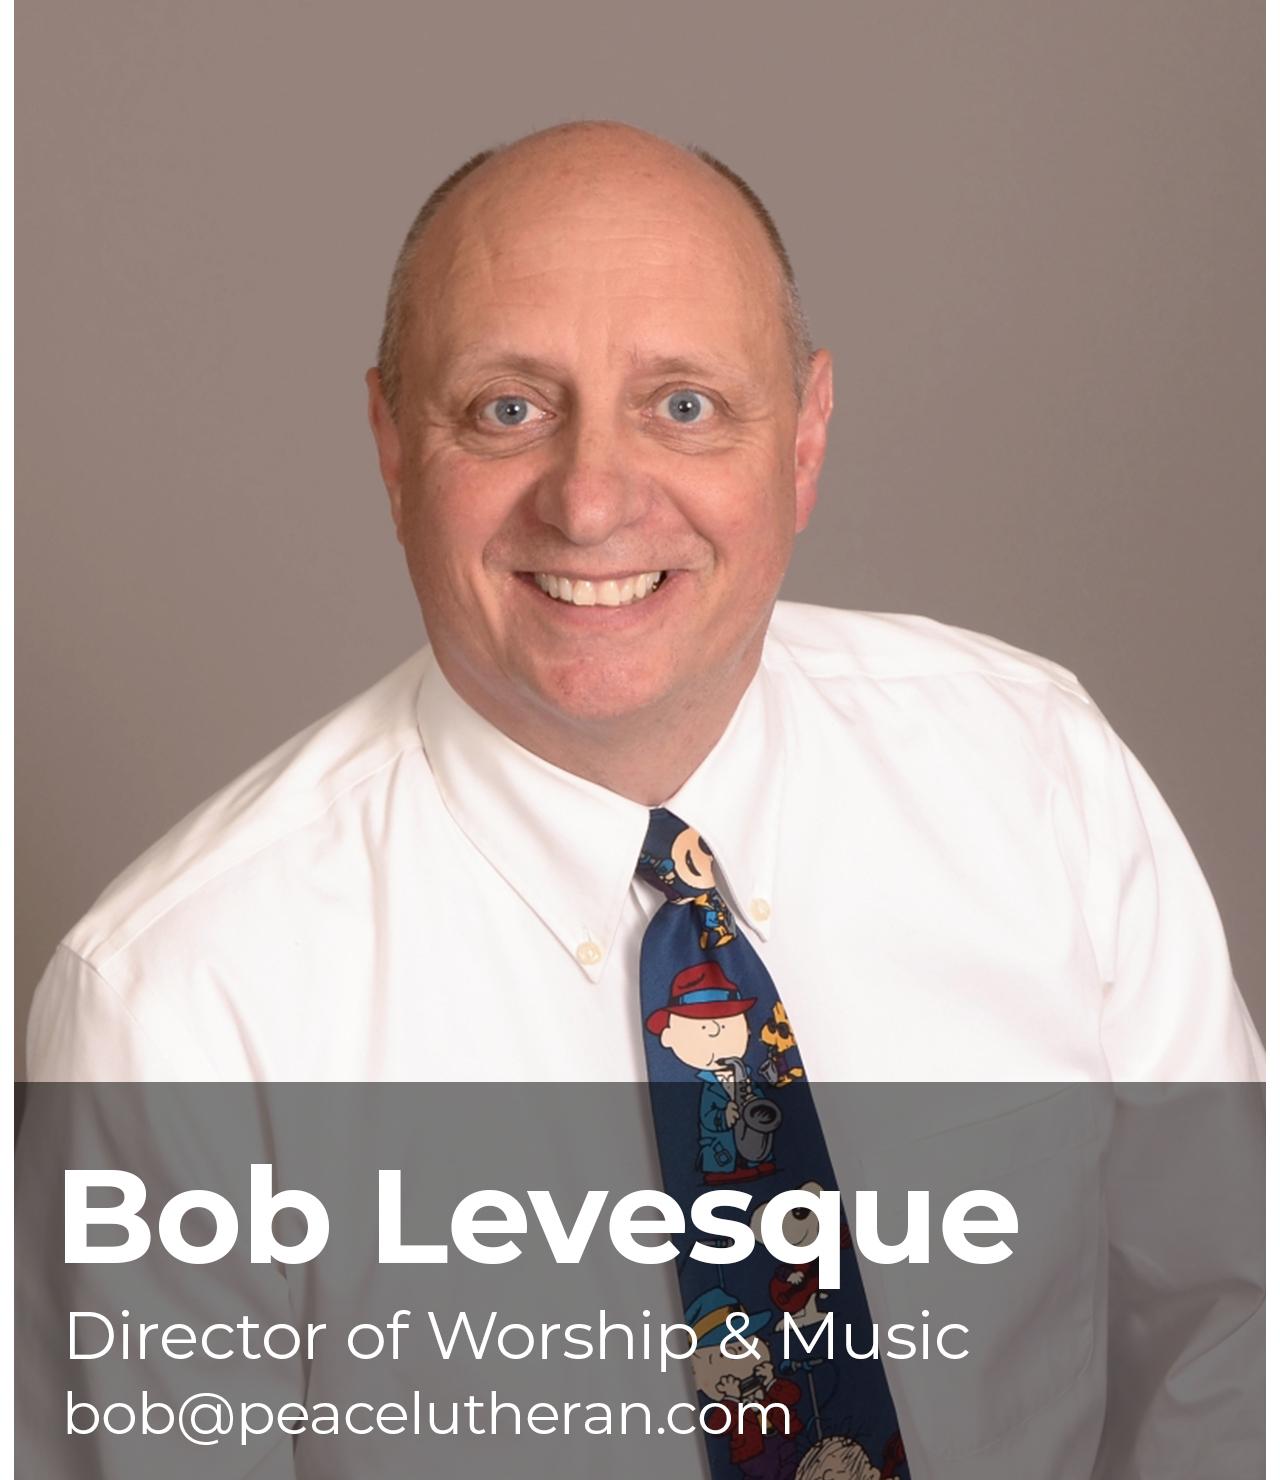 Bob Levesque